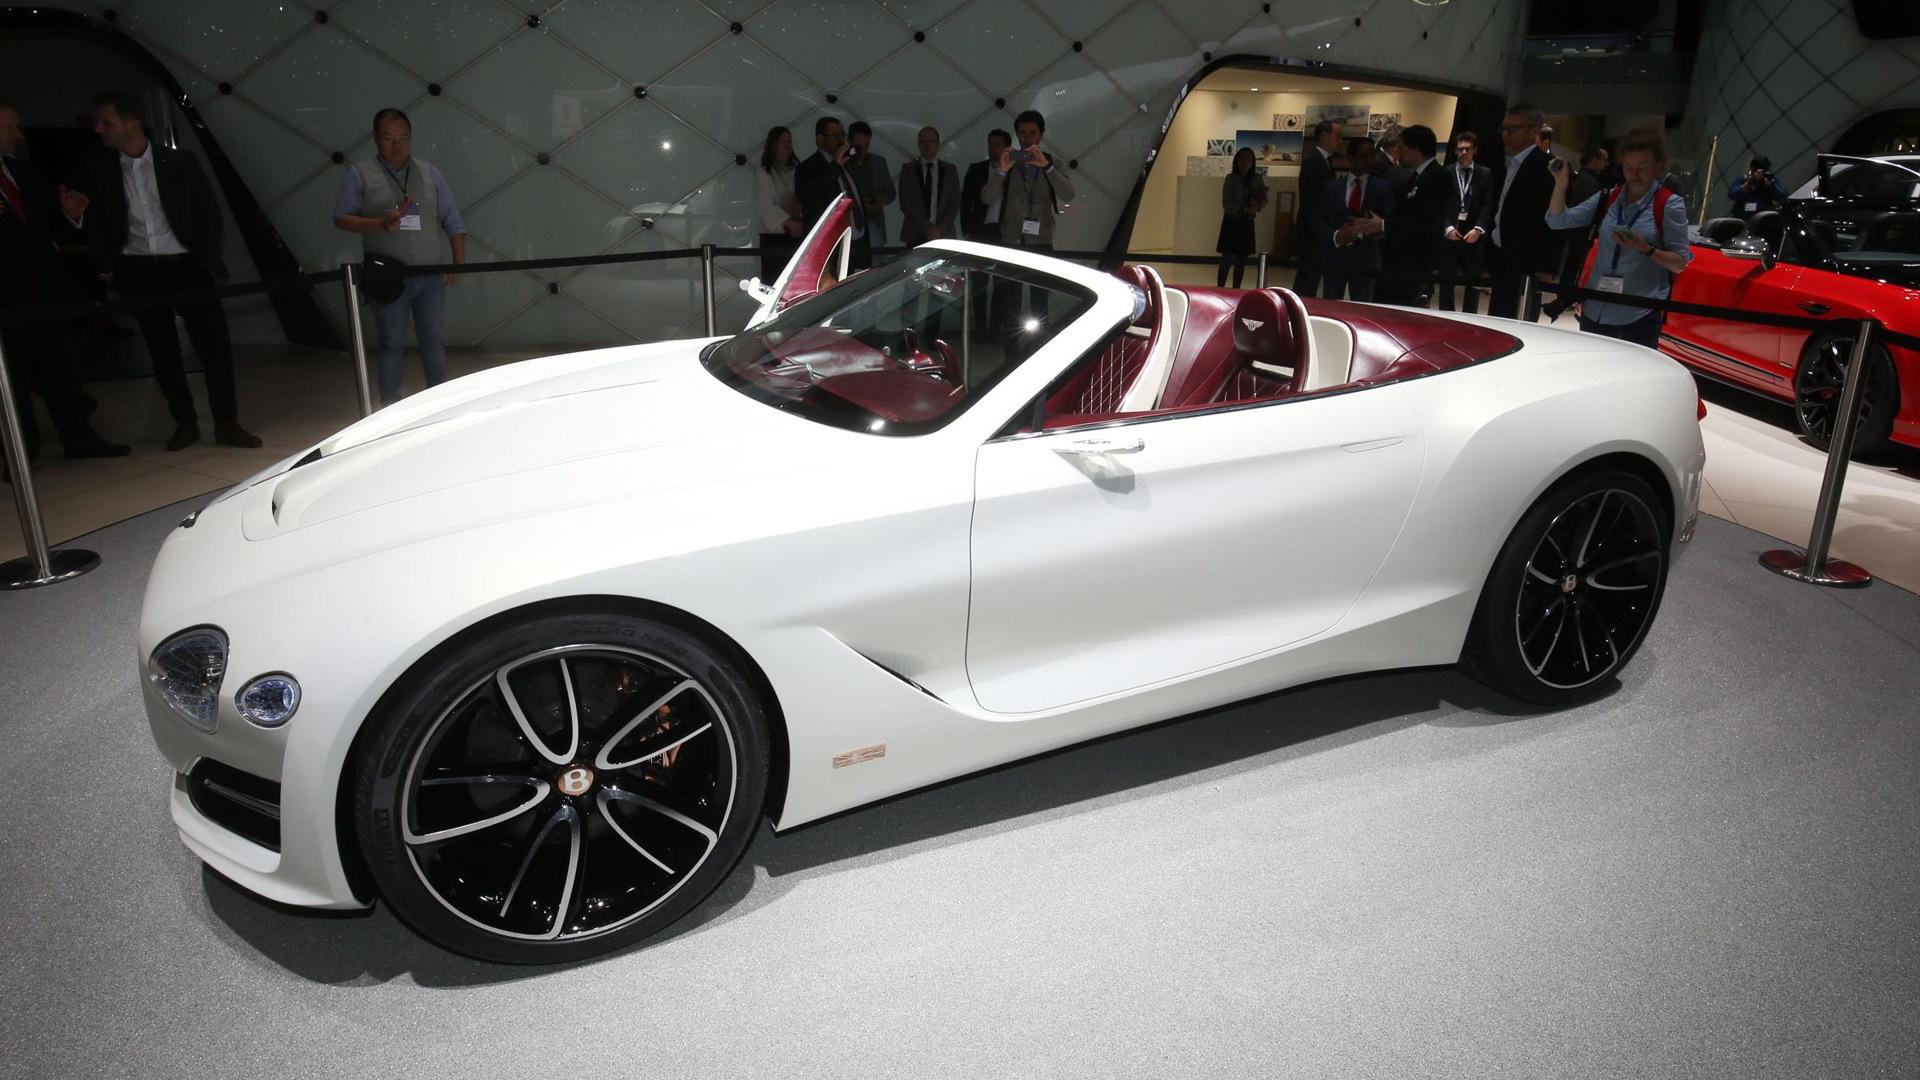 bentley exp 12 speed 6e teases continental gt convertible, ev future